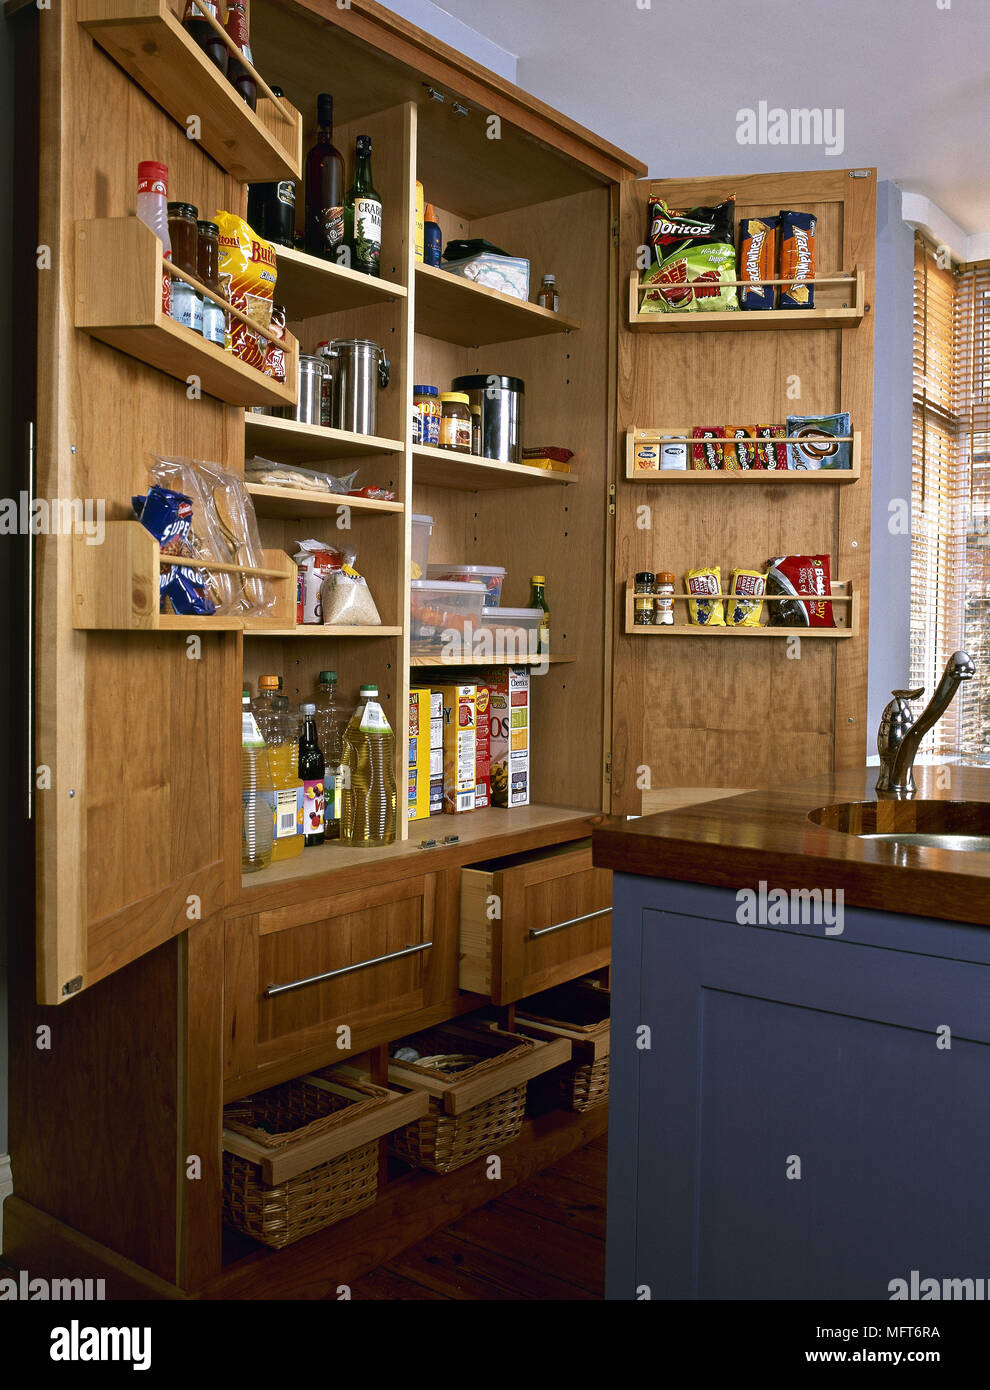 Moderna cucina freestanding dispensa alimentare interni cucine ...